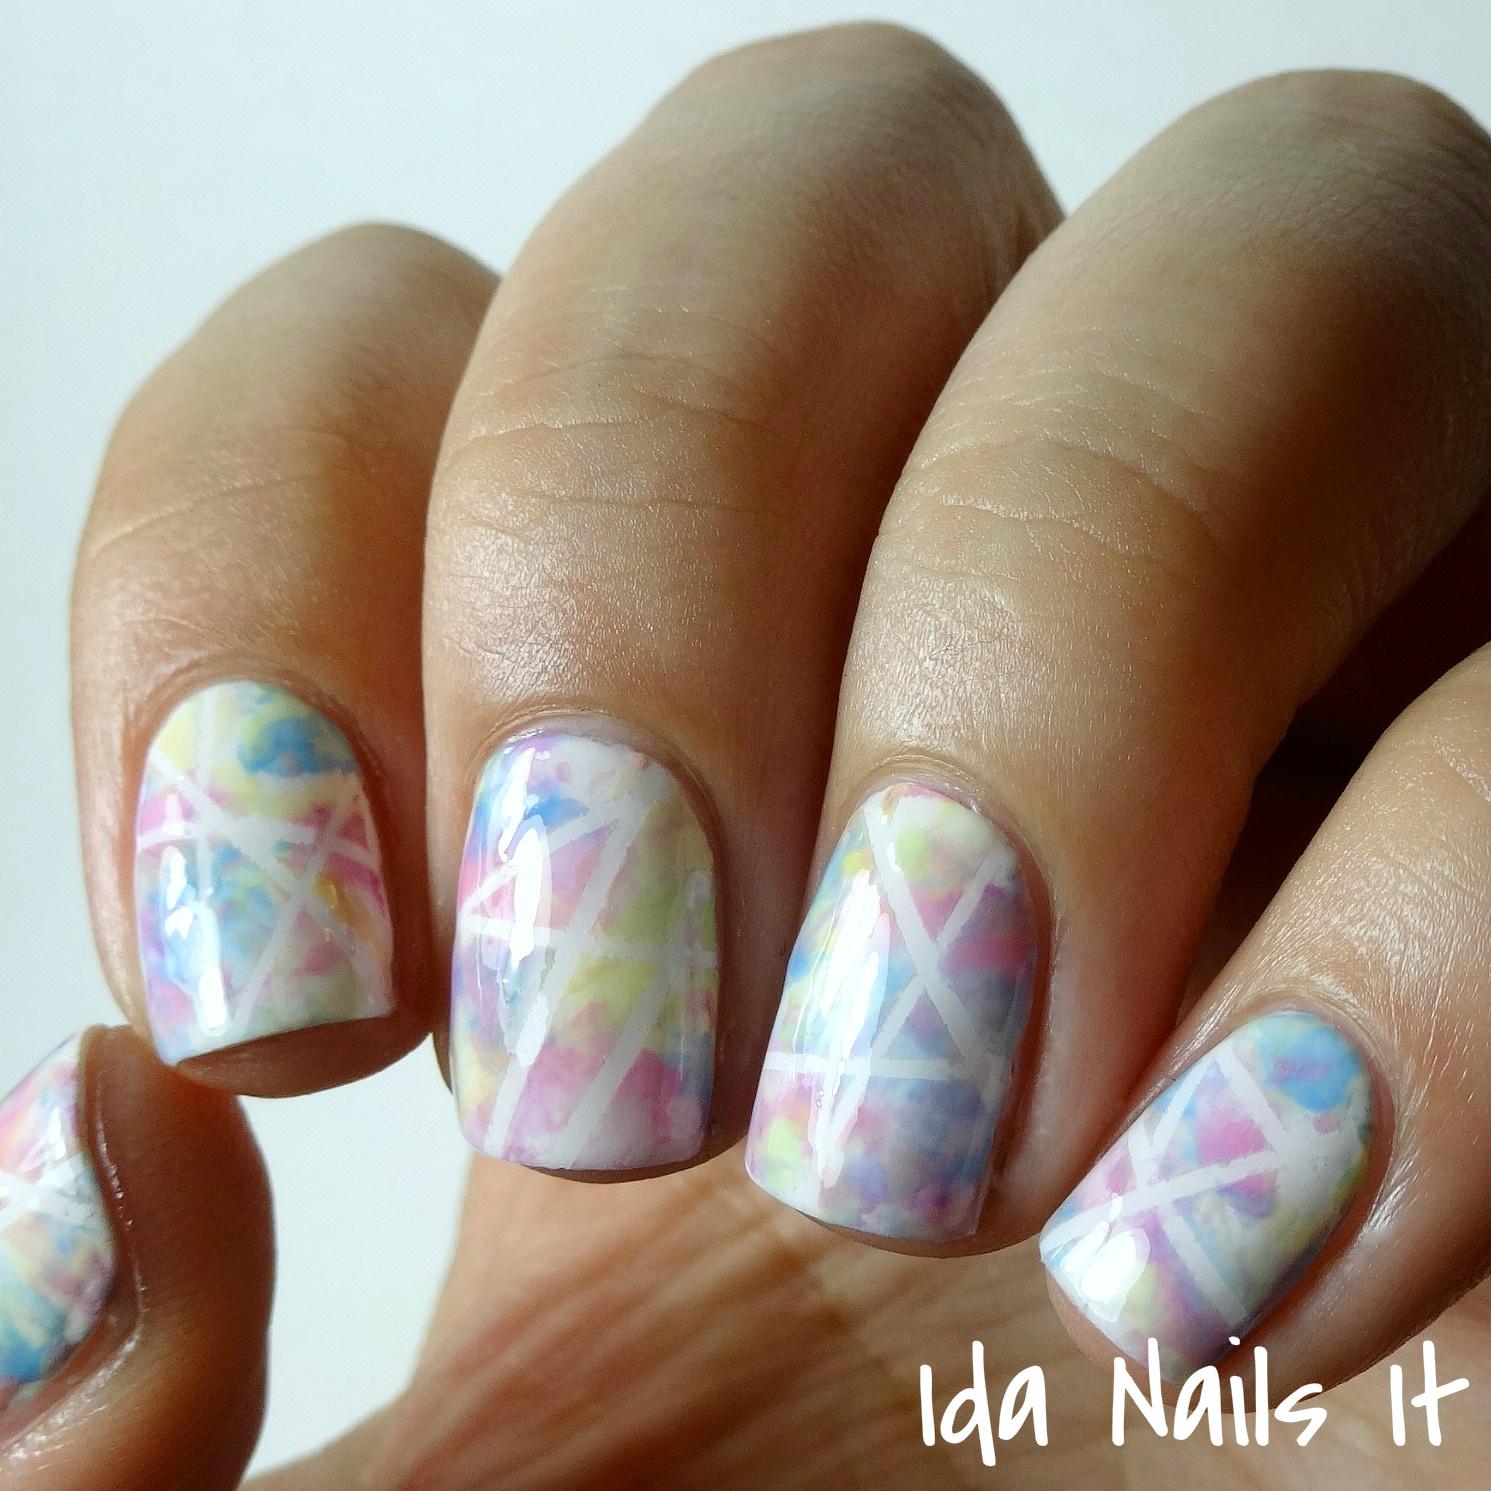 Finger Nail Paint: Ida Nails It: Paint All The Nails Presents: Pastel Geometric